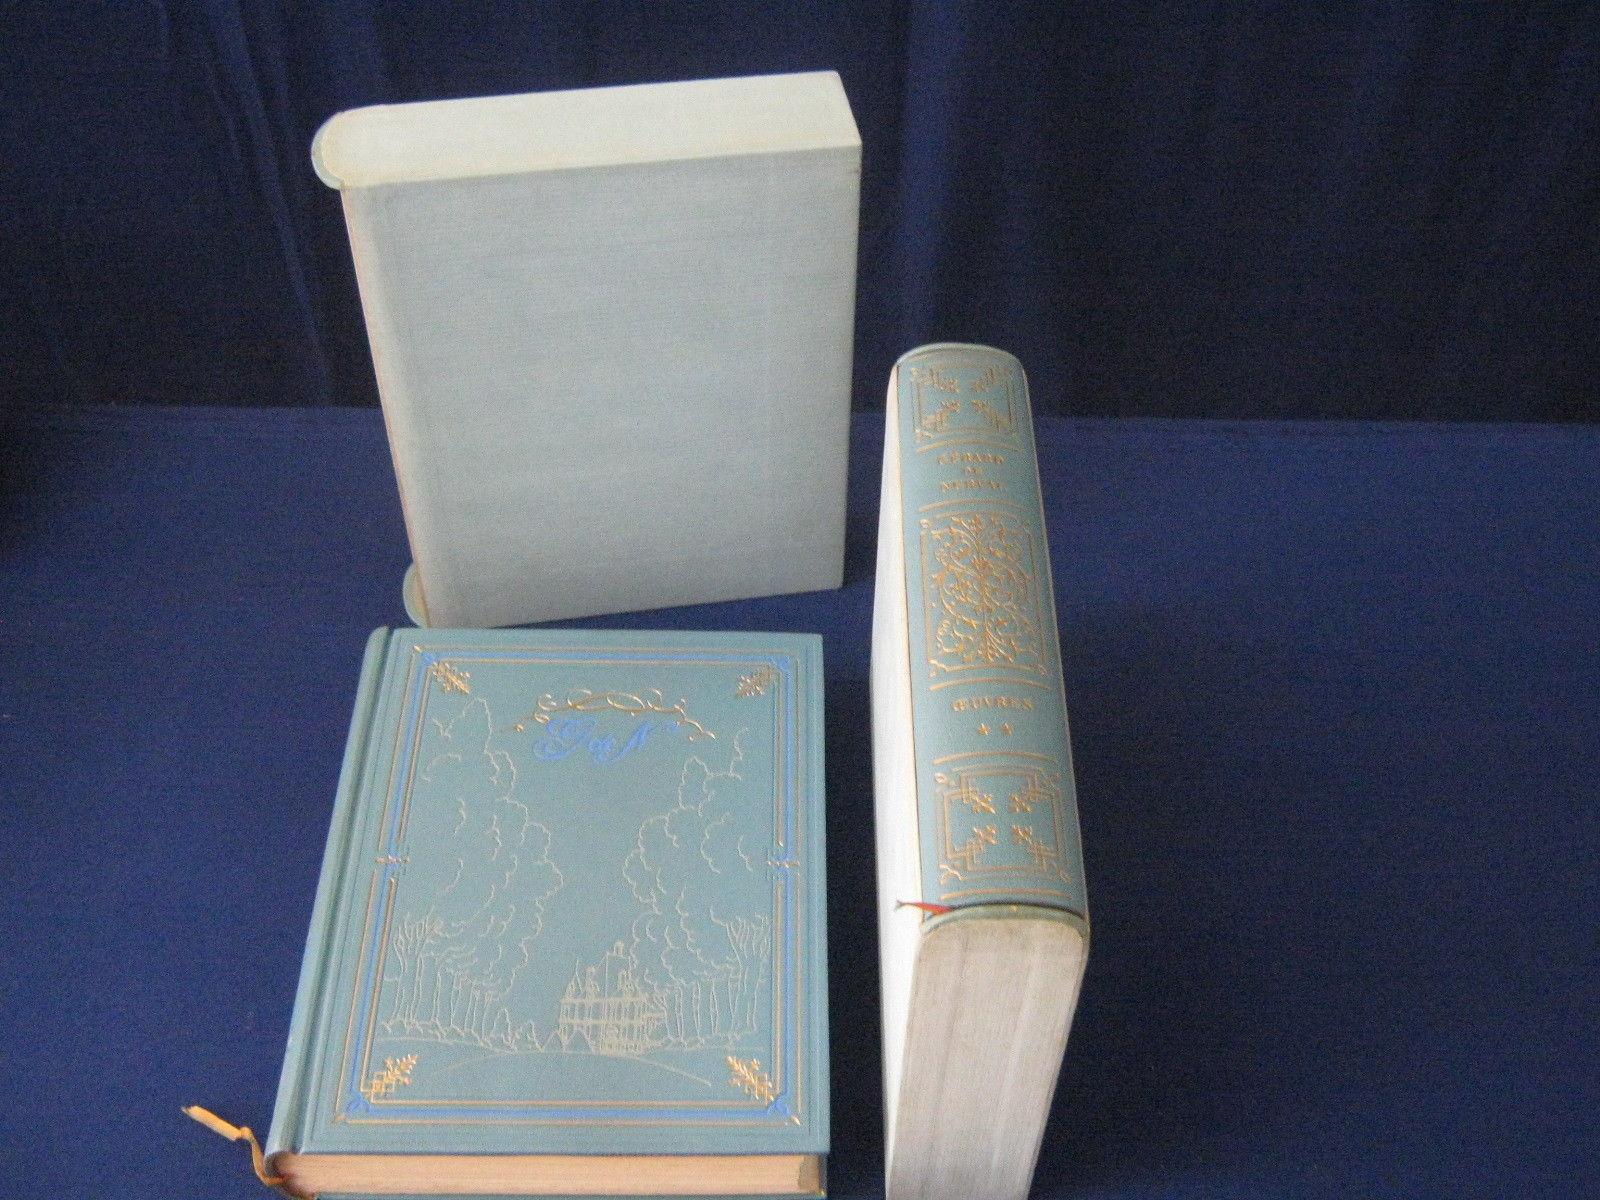 Oeuvres Gérard de Nerval [Fine] [Hardcover] (bi_18730090854) photo